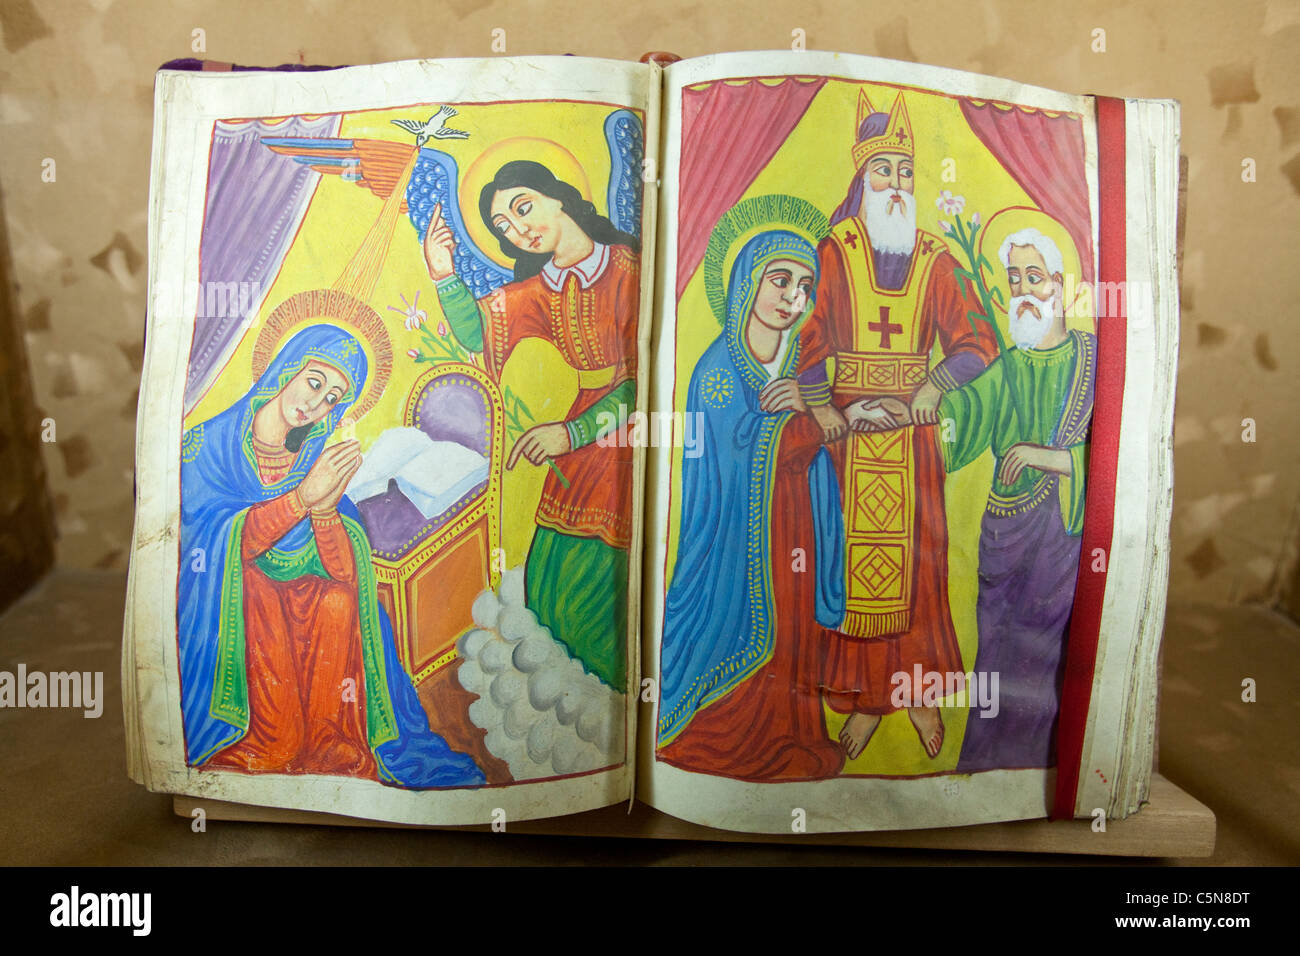 Colourful ancient Christian illustration, St George Museum, Addis Ababa, Ethiopia - Stock Image